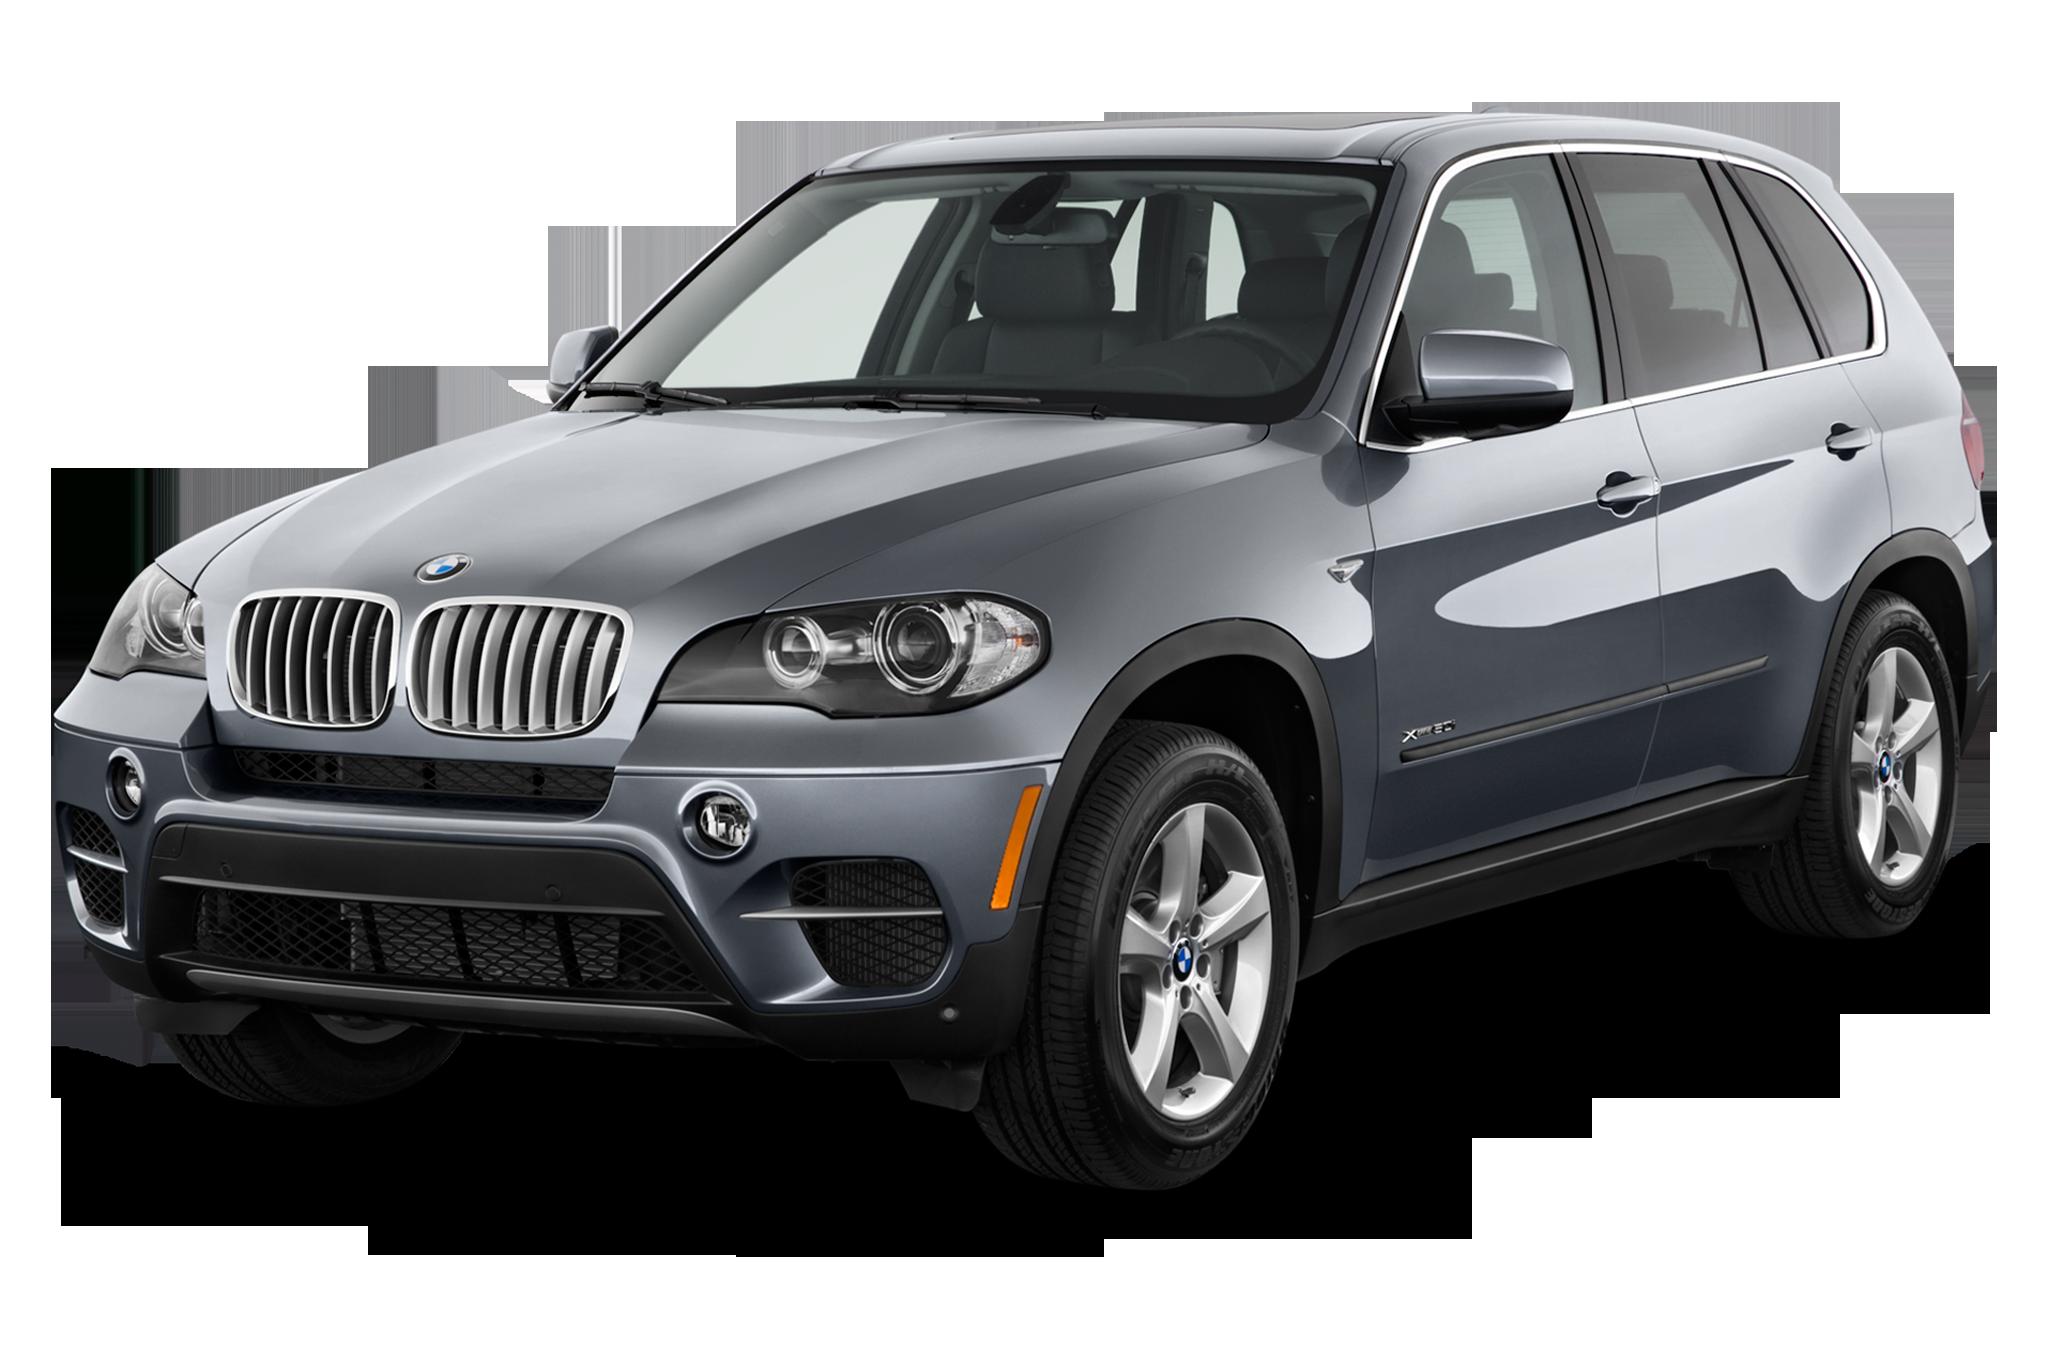 BMW X5 M I (E70) 2009 - 2014 SUV 5 door #4